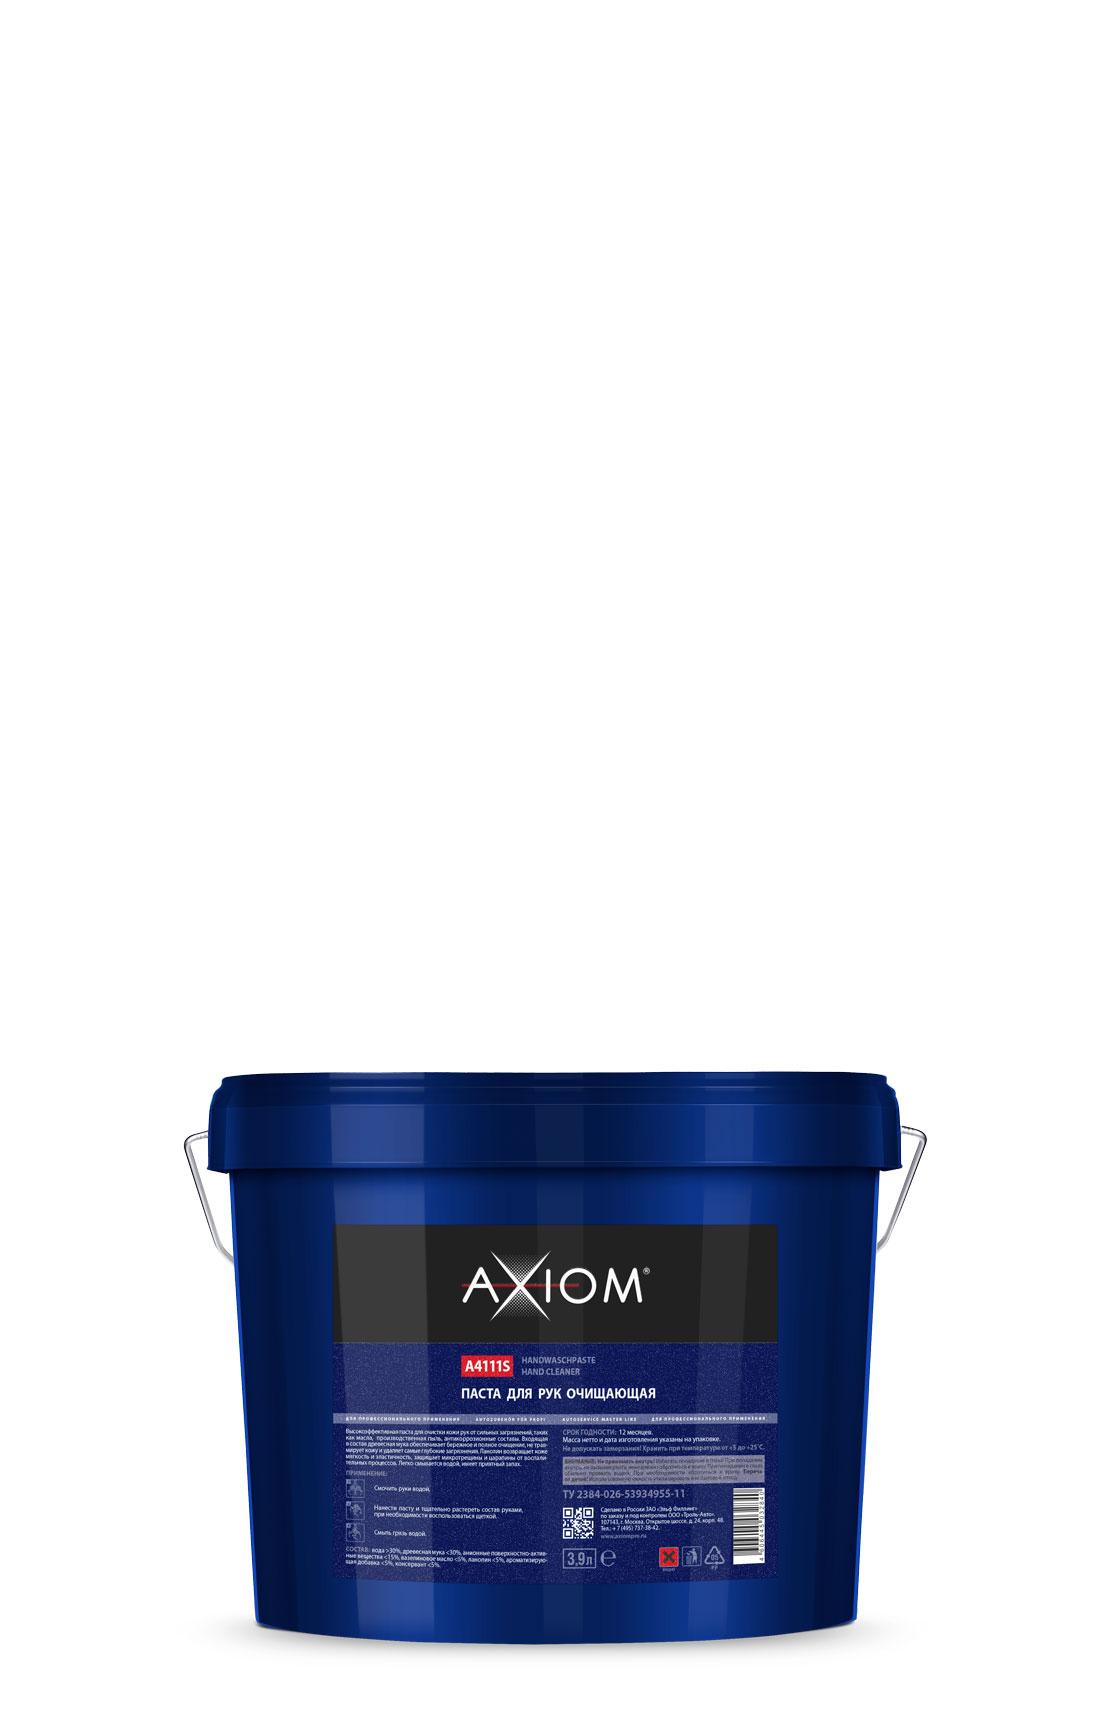 AXIOM A4111s Паста для рук очищающая 3.9 л.